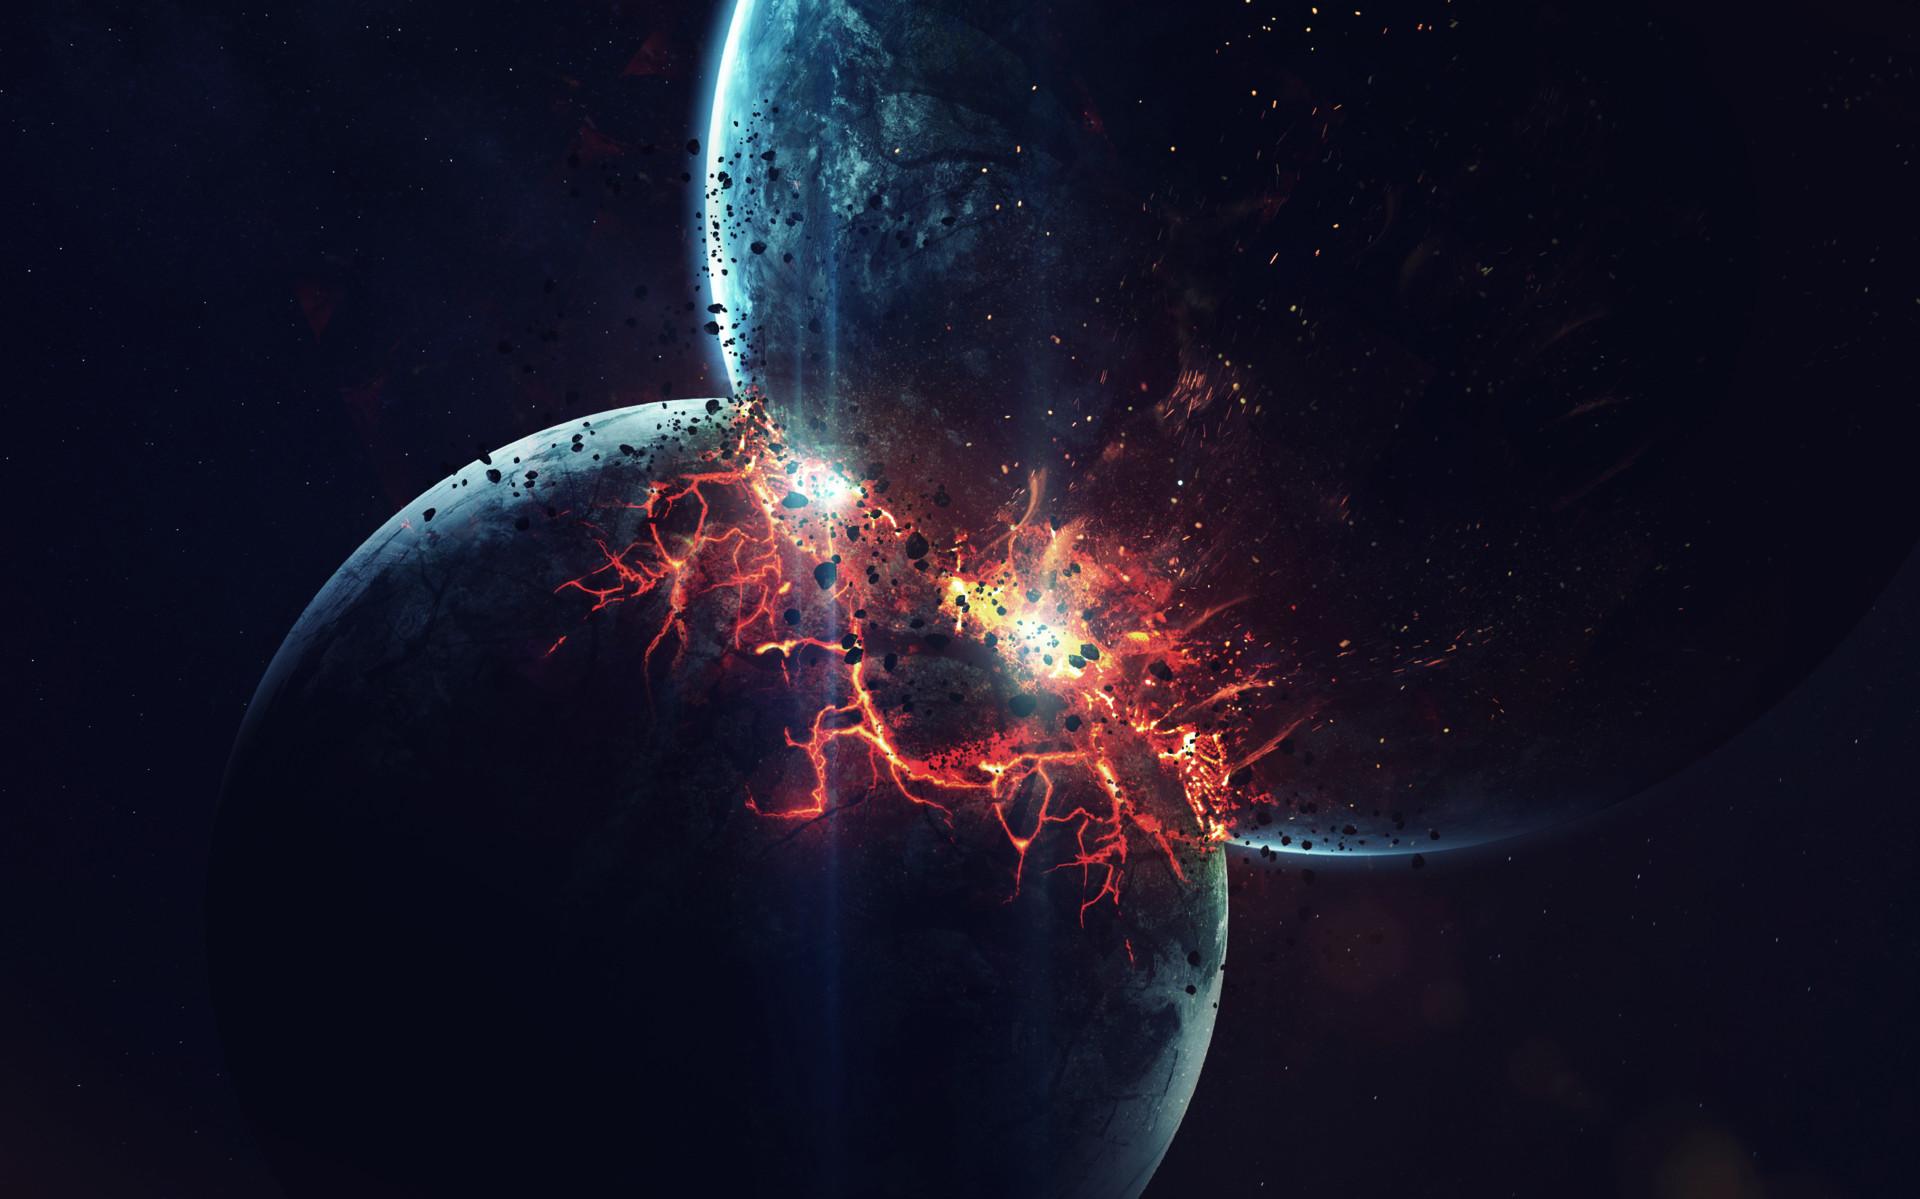 Sci Fi Collision 1920x1199